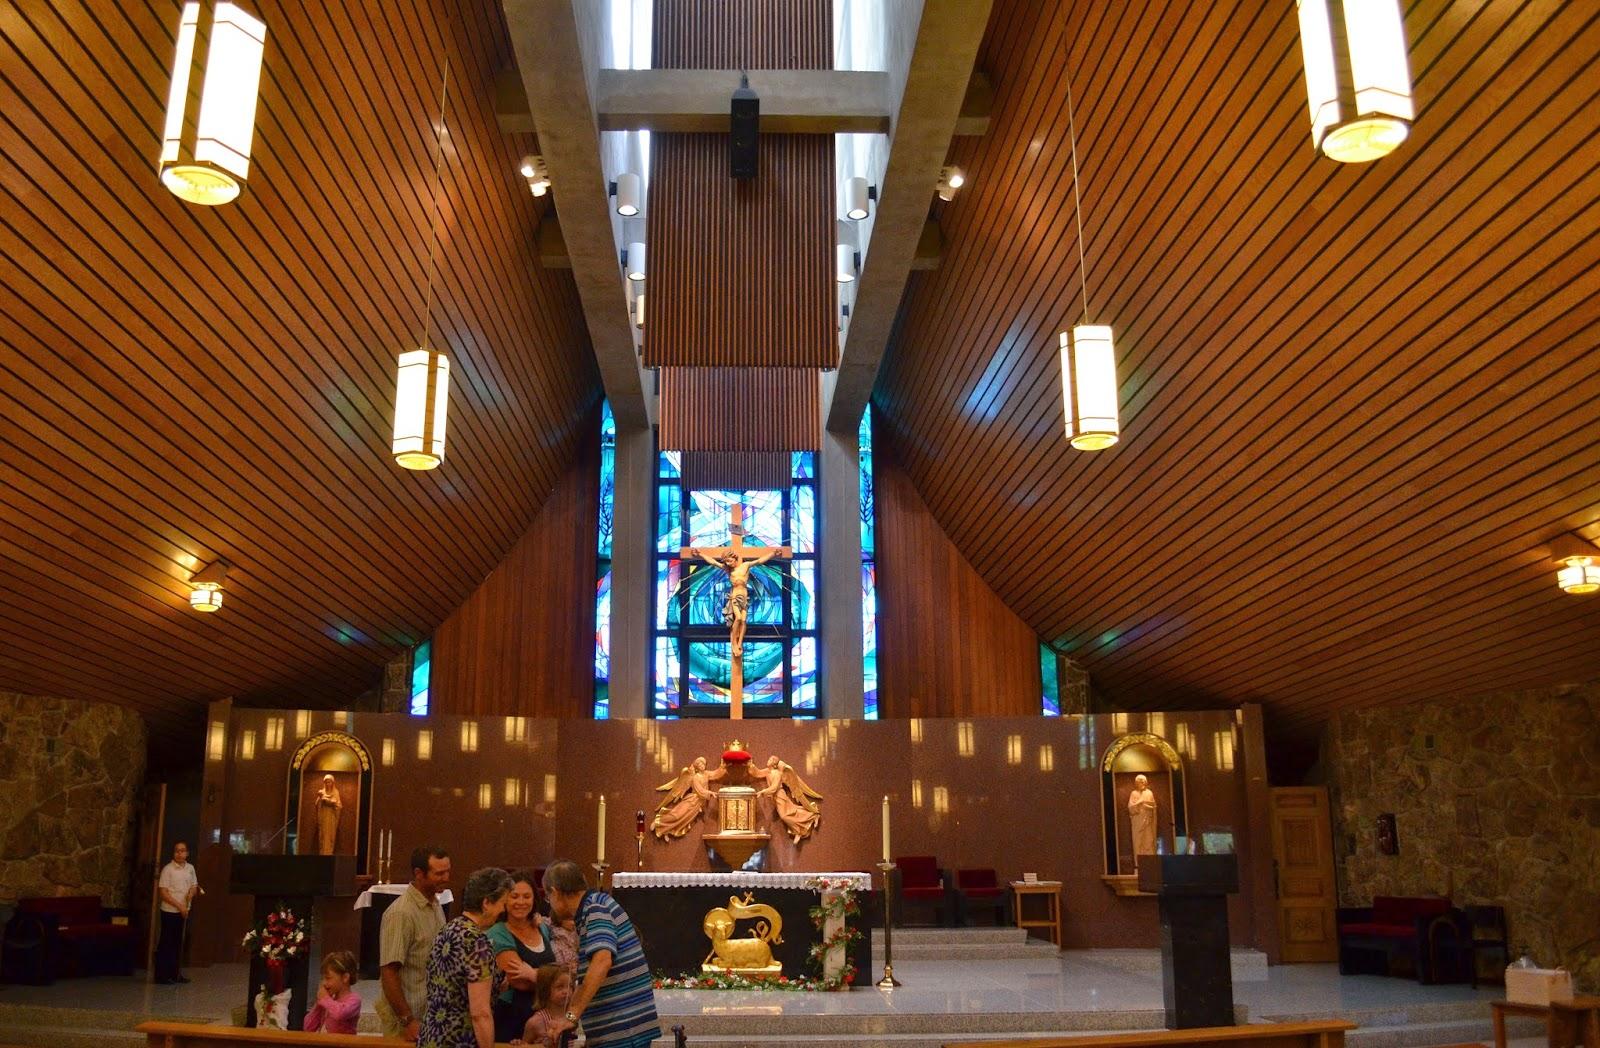 the chow 39 s colorado catholic churches tour church 20. Black Bedroom Furniture Sets. Home Design Ideas